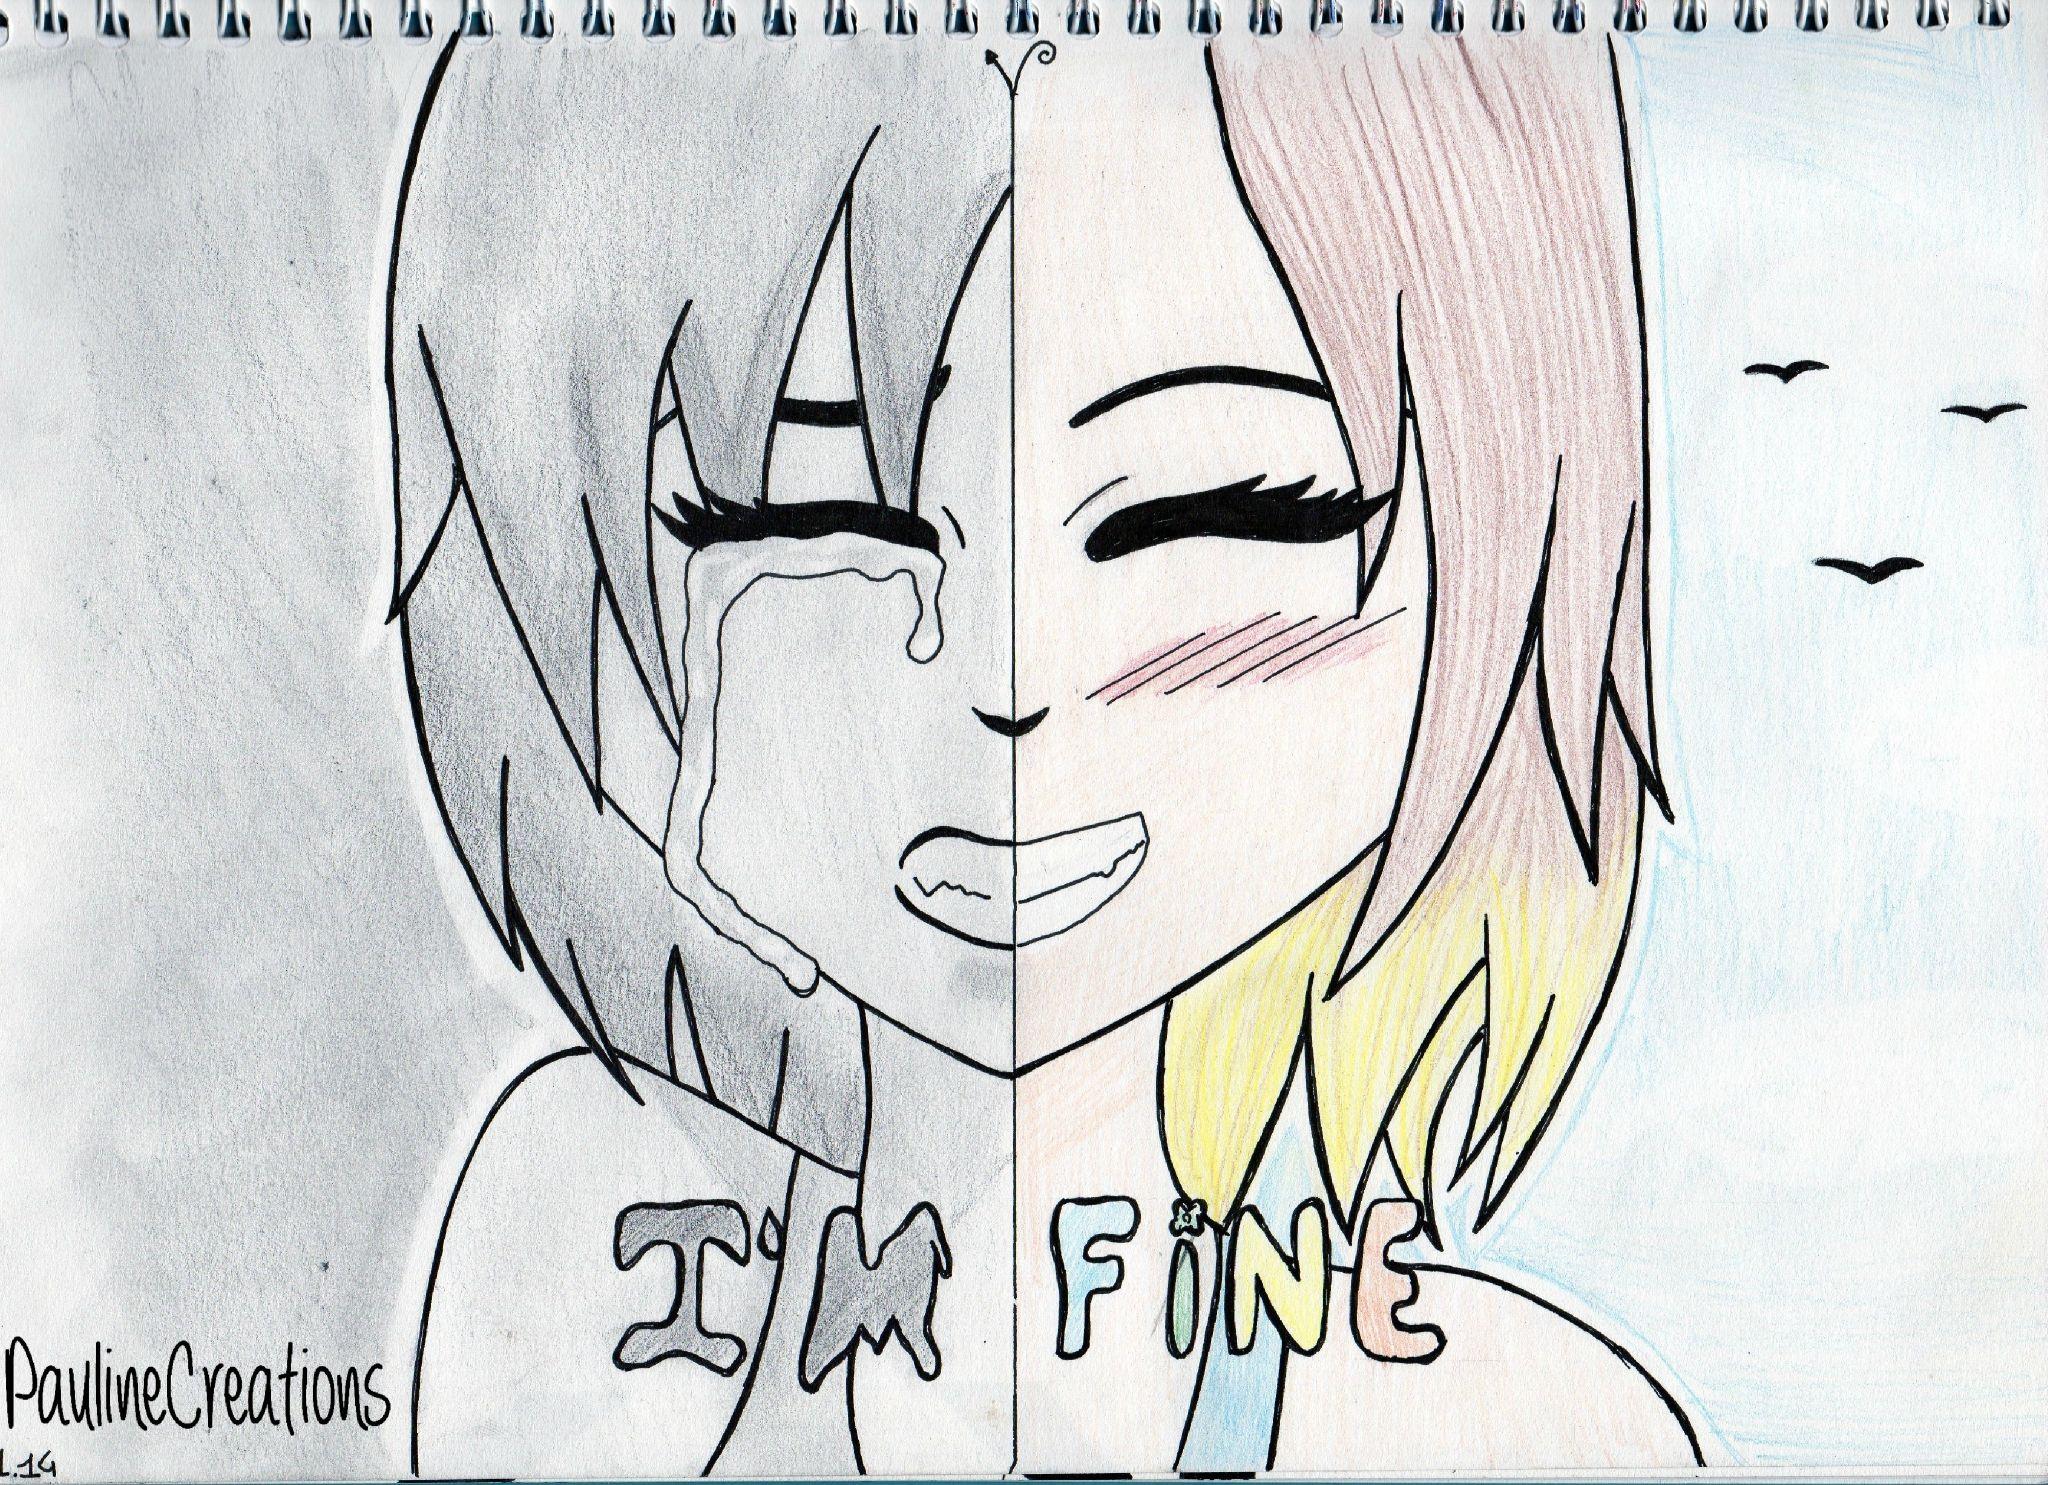 Afficher Limage Dorigine Dessins Faciles Dessin Manga